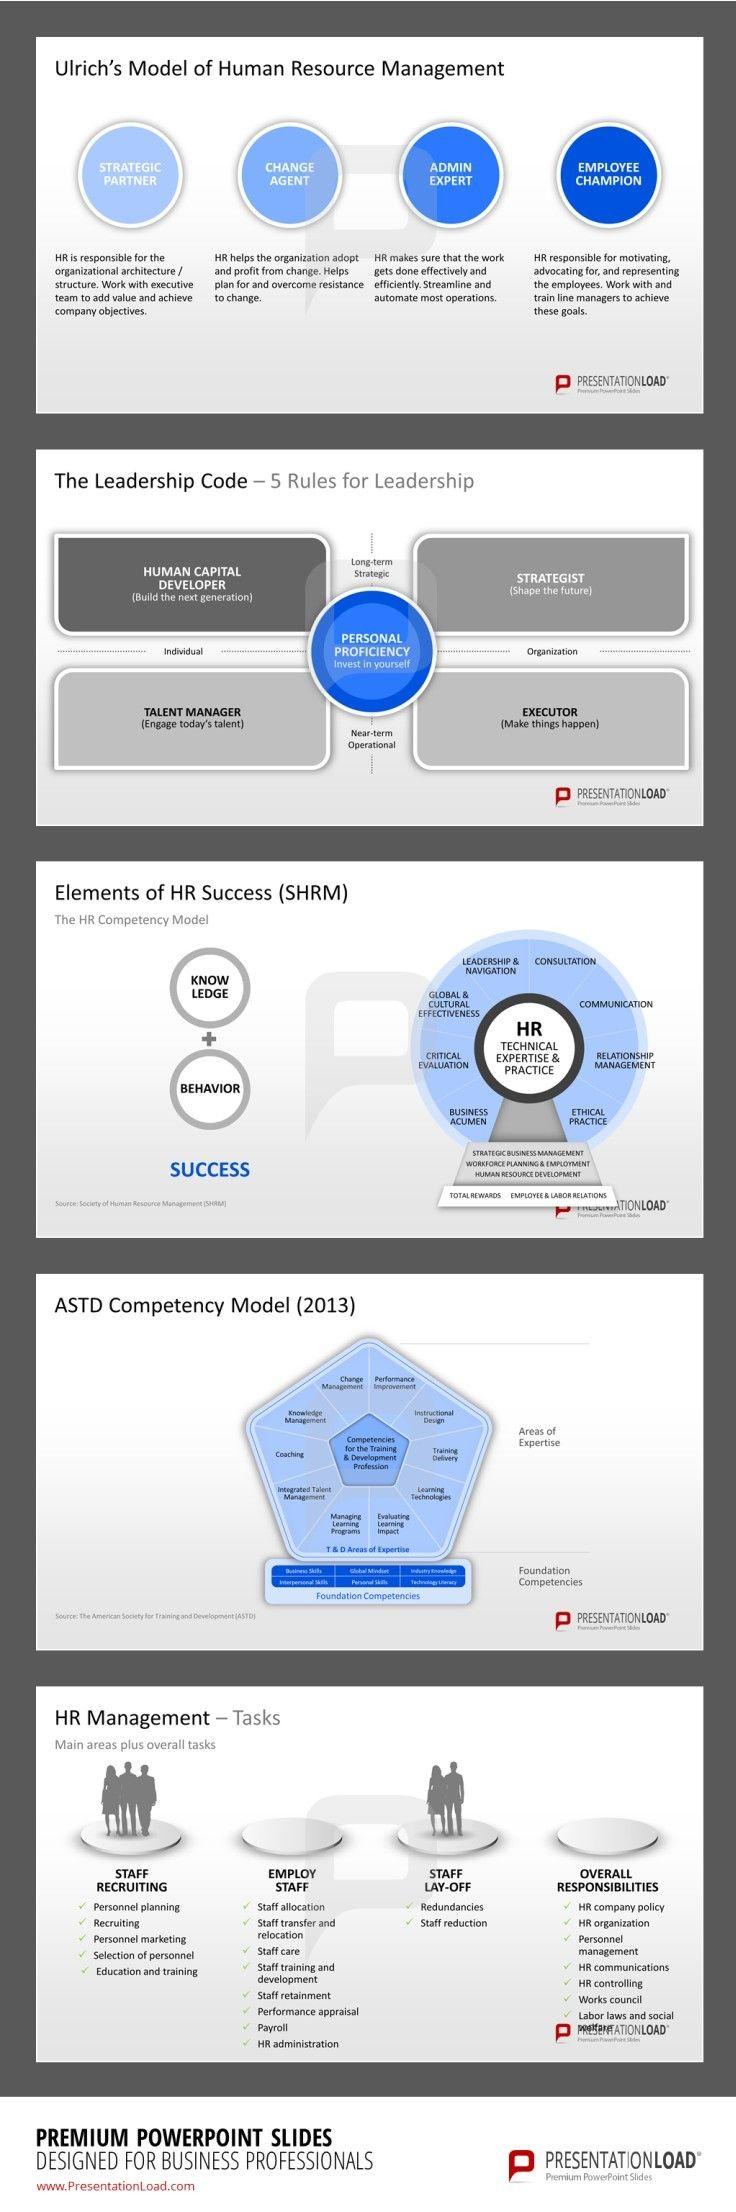 Human resources change powerpoint presentation